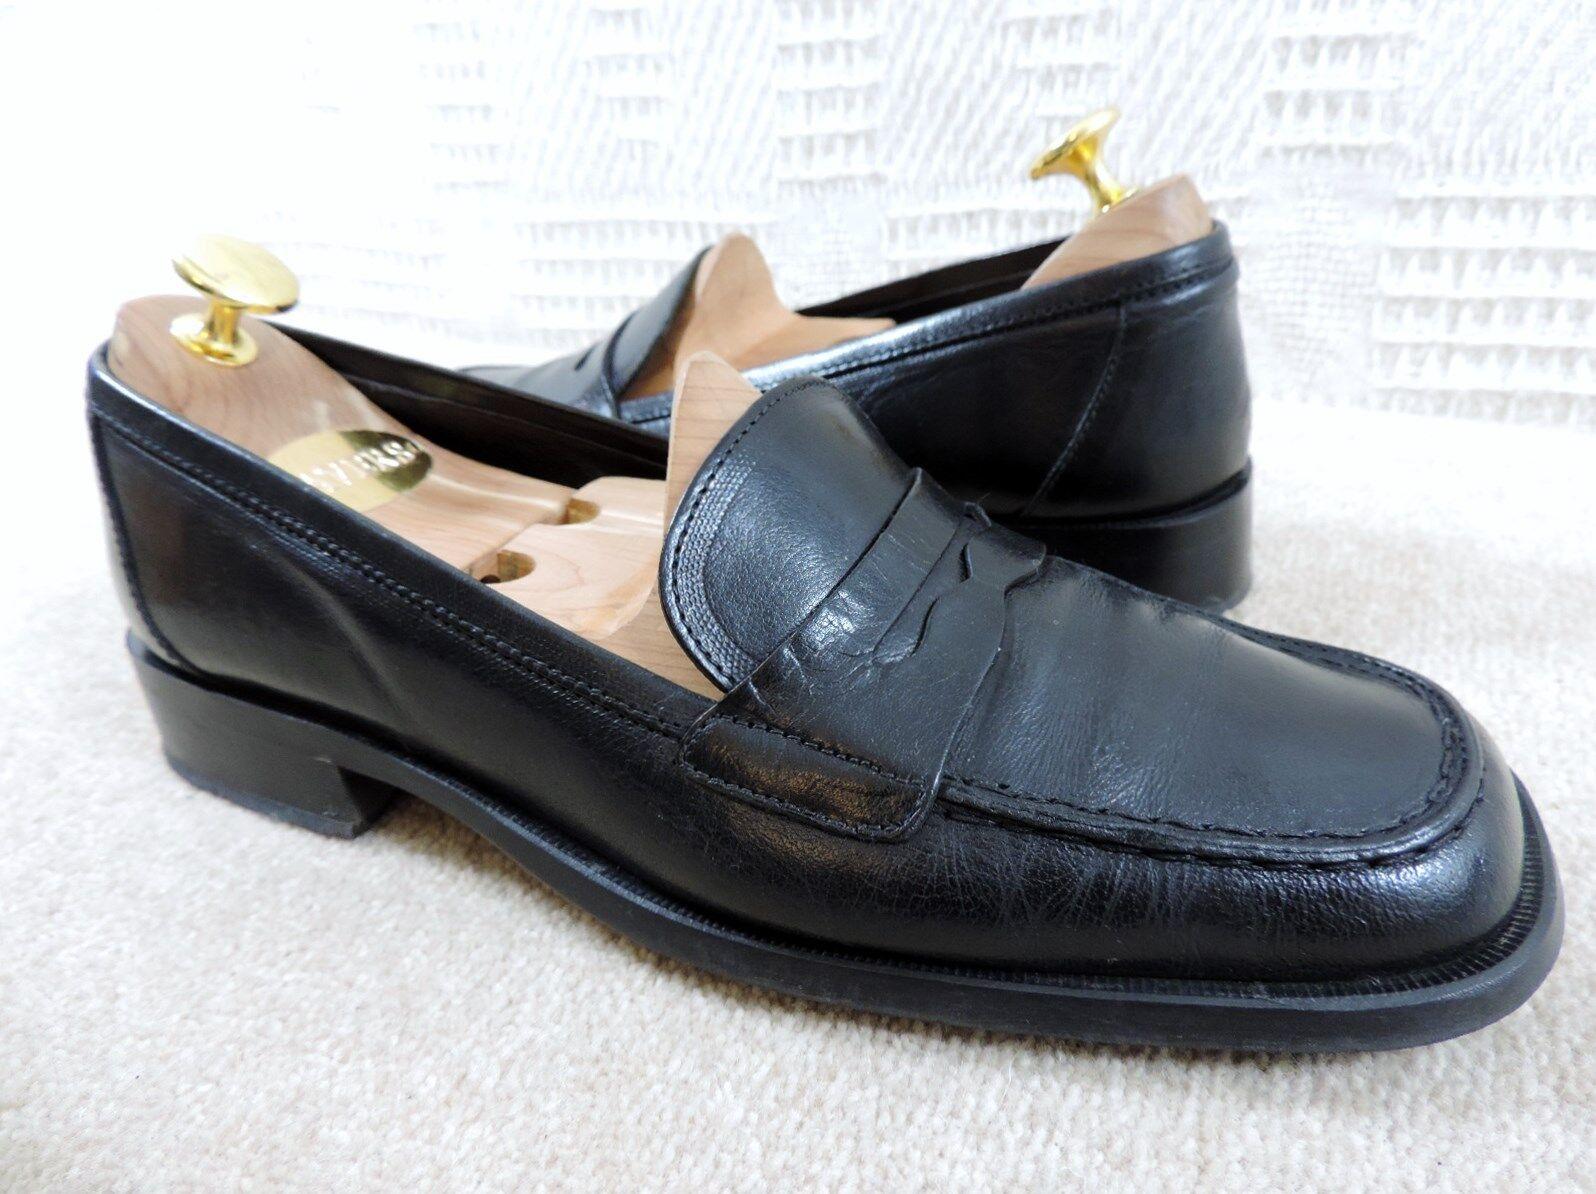 Diego Bellini Italian  Uomo Penny Loafers Good for Church UK 6 US 7 EU 40